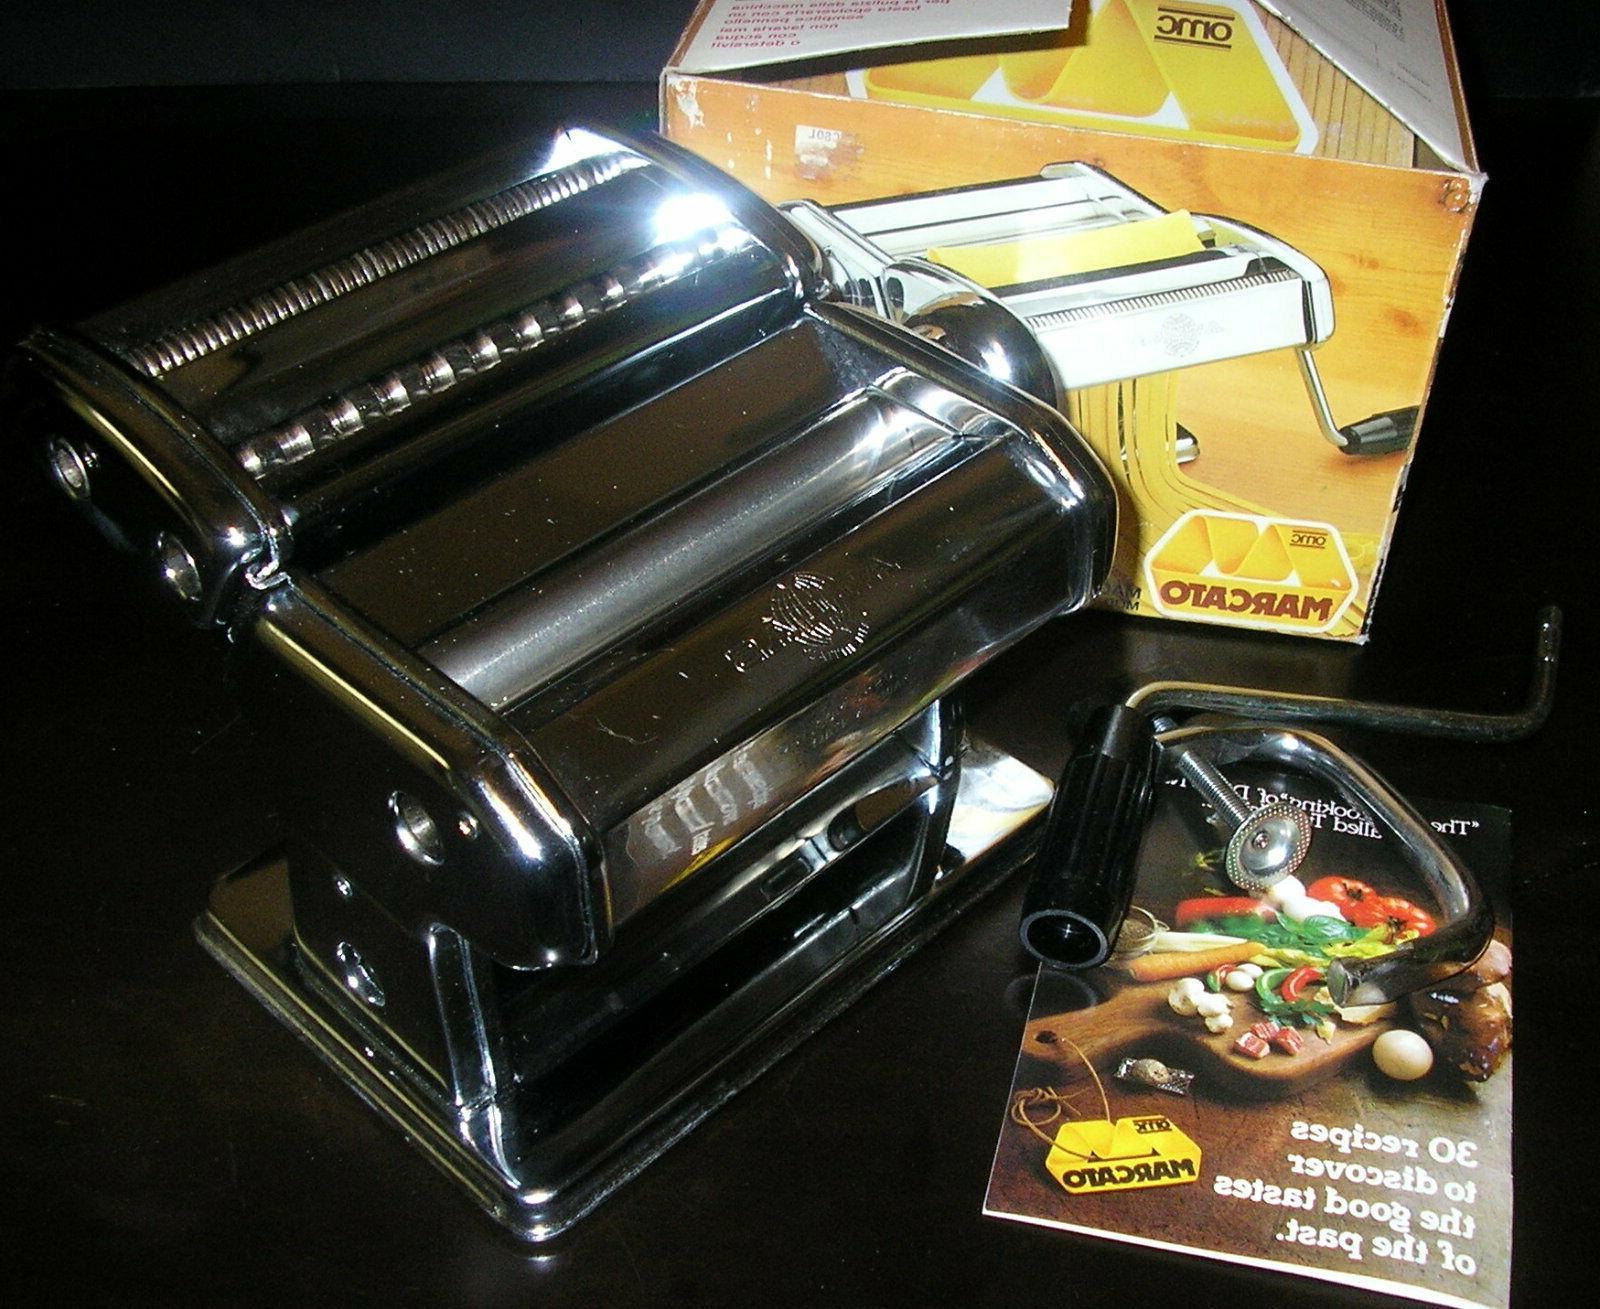 omc atlas manual pasta maker machine in